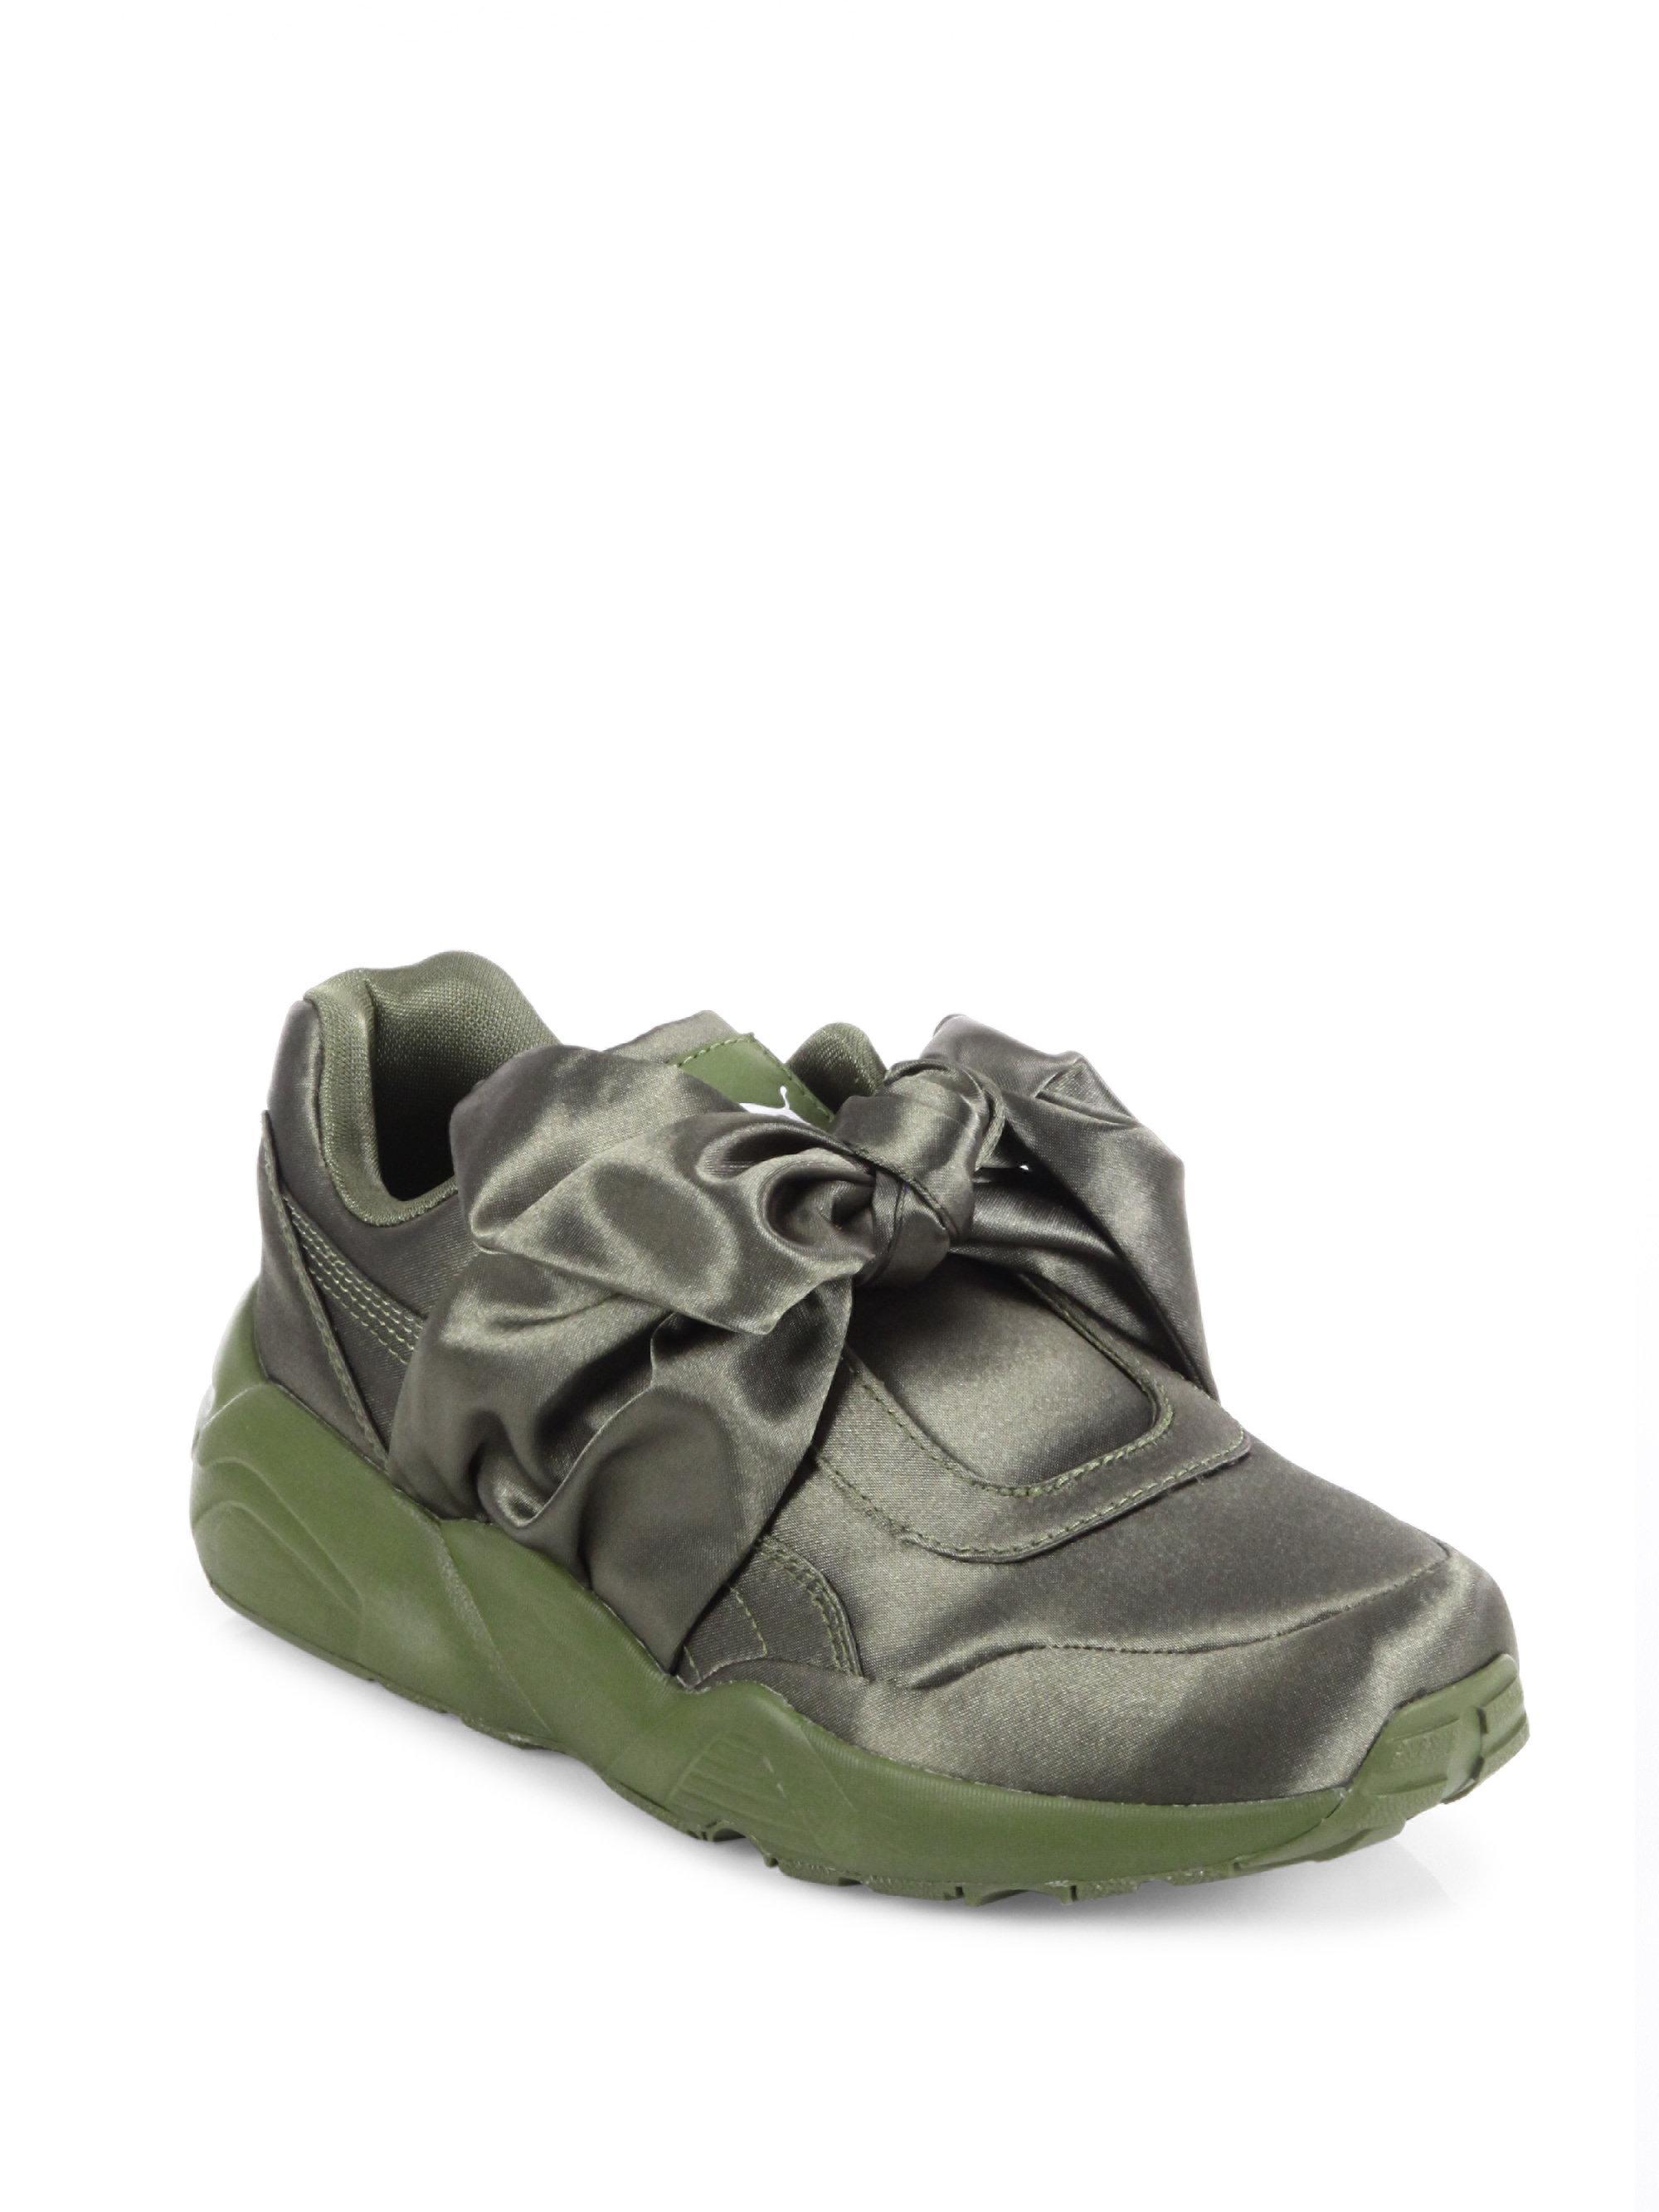 buy cheap ec095 94fb3 PUMA Fenty X Rihanna Satin Bow Sneakers in Green - Lyst